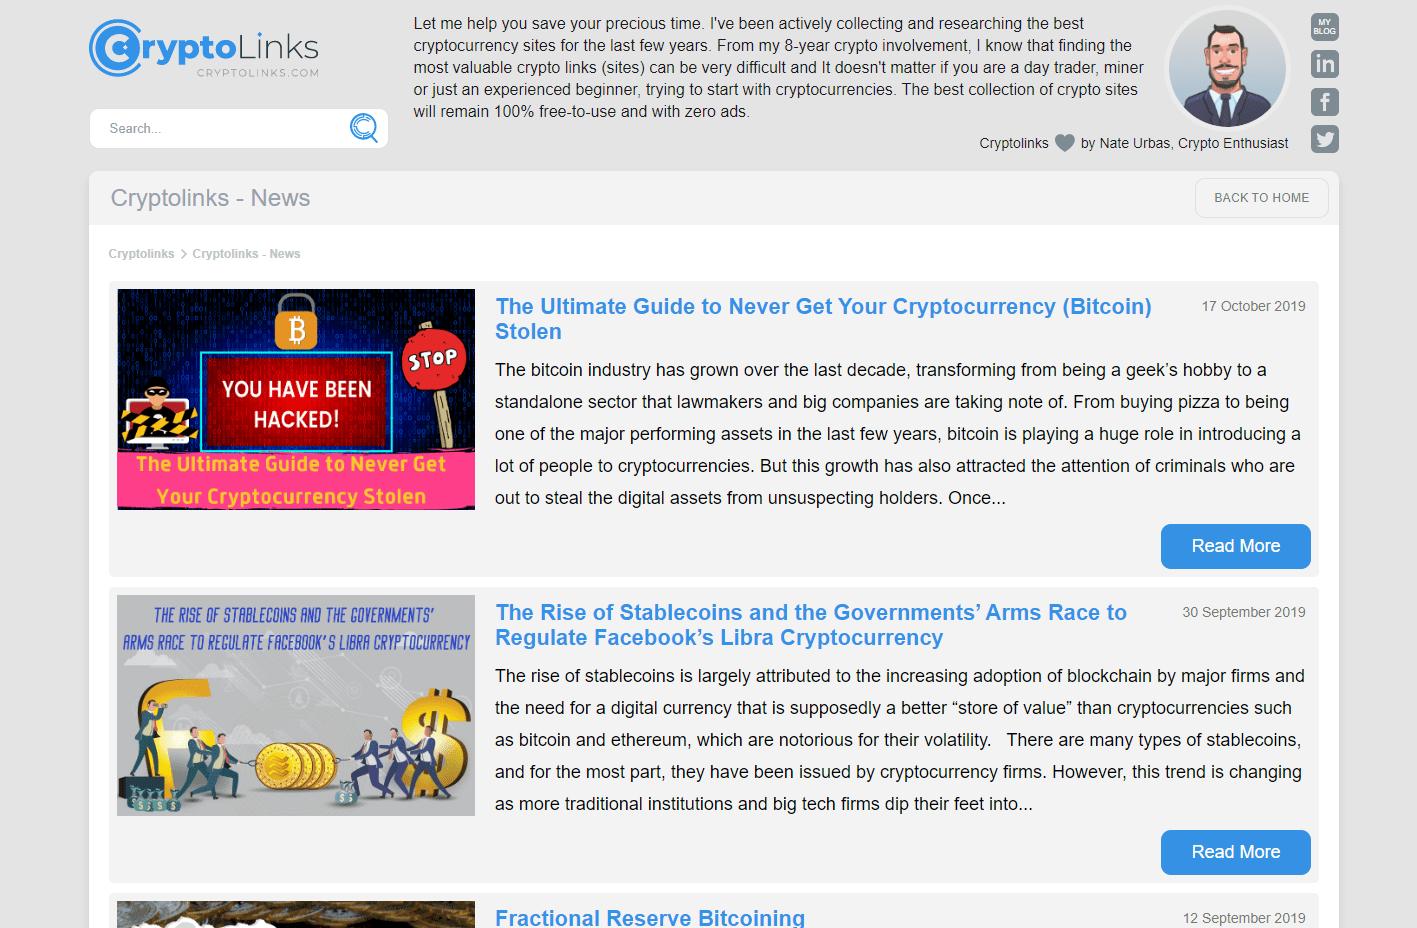 Cryptolinks Google Chrome 2019 10 22 09.01.54